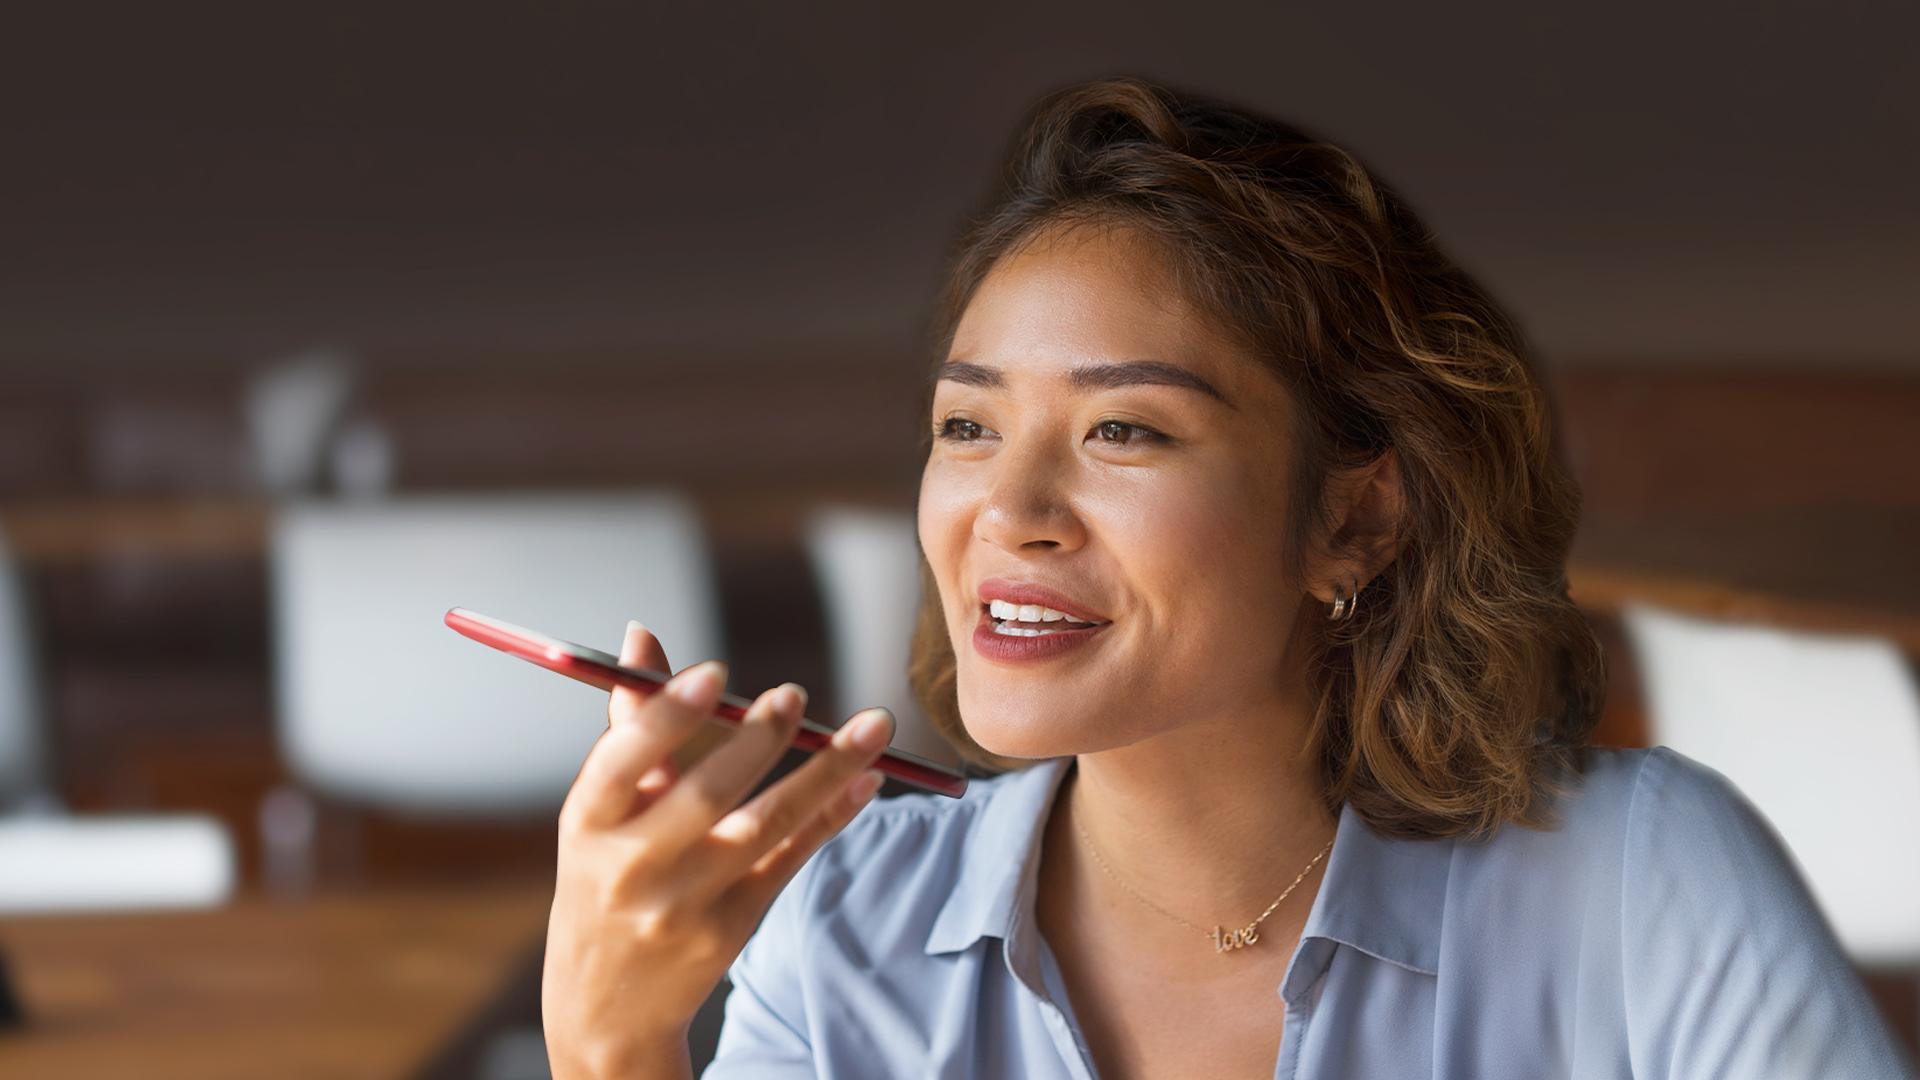 Woman speaking into smartphone